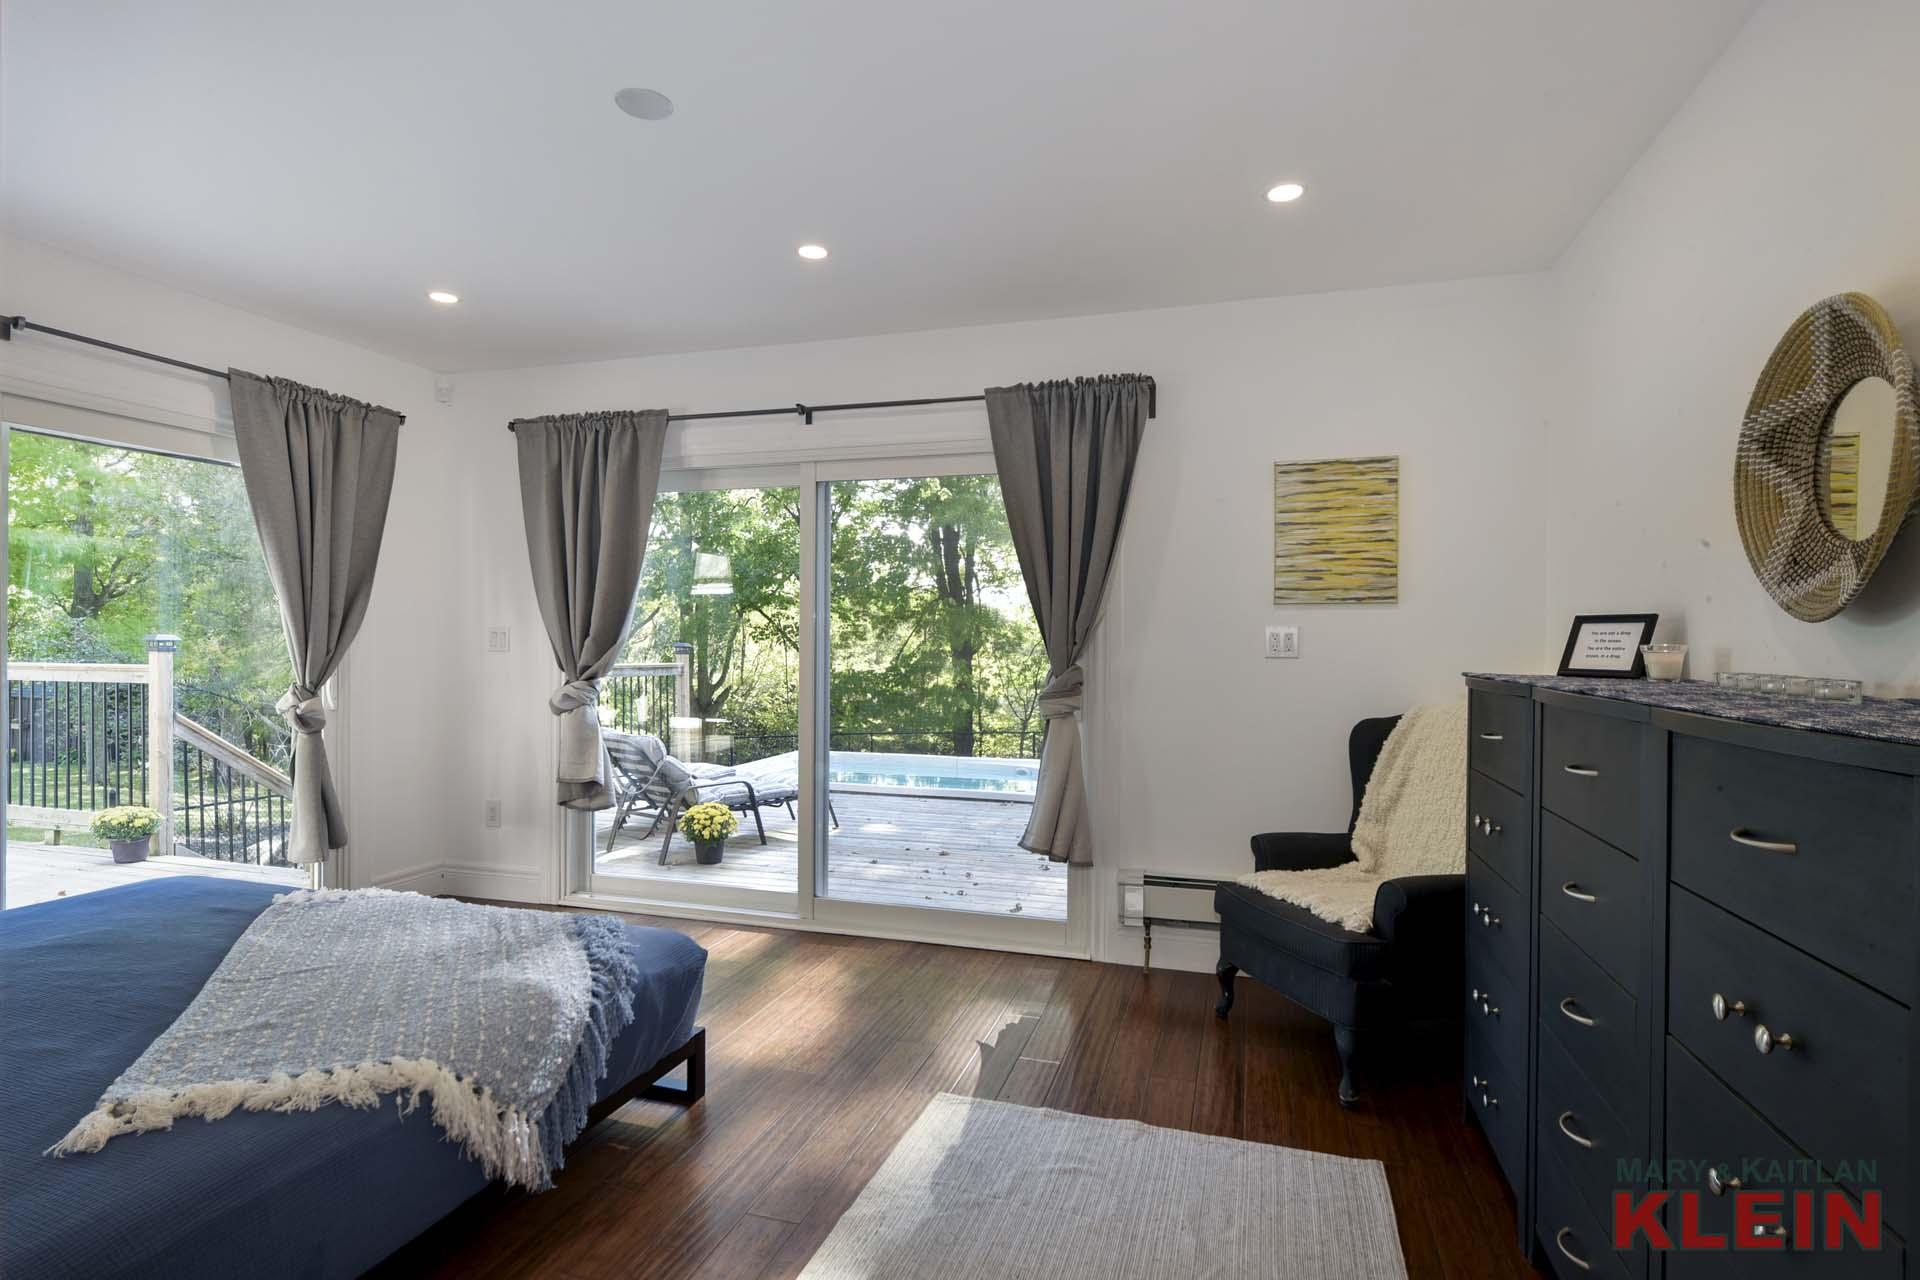 Master Bedroom - Bamboo Flooring, 3-piece Ensuite, Sliding Barn doors